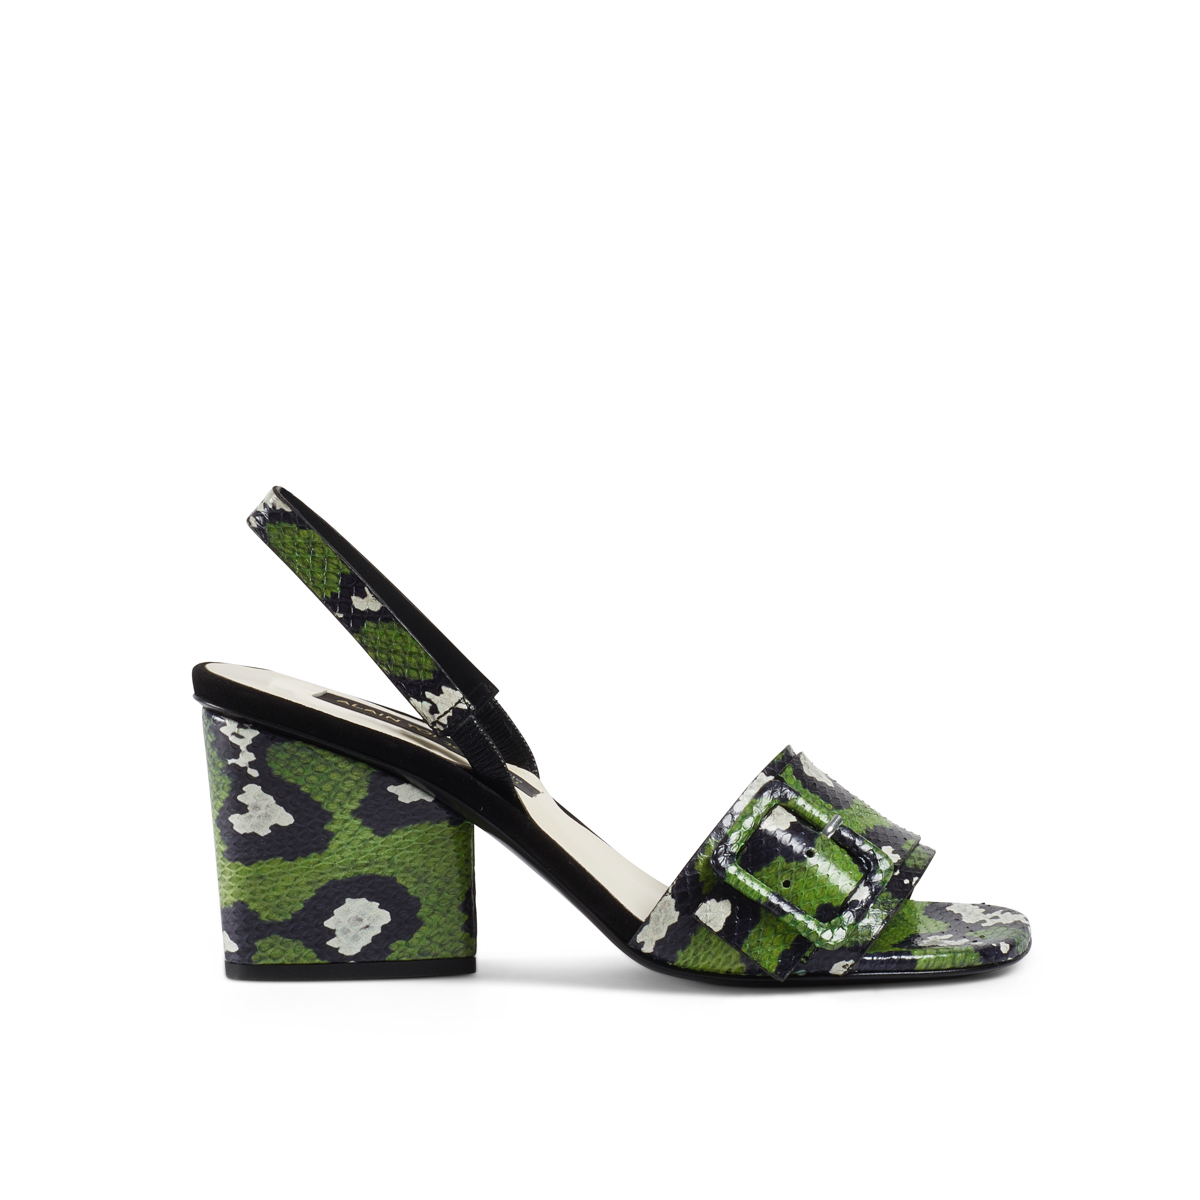 032_alaintondowski_springsummer2017_shoes_3036